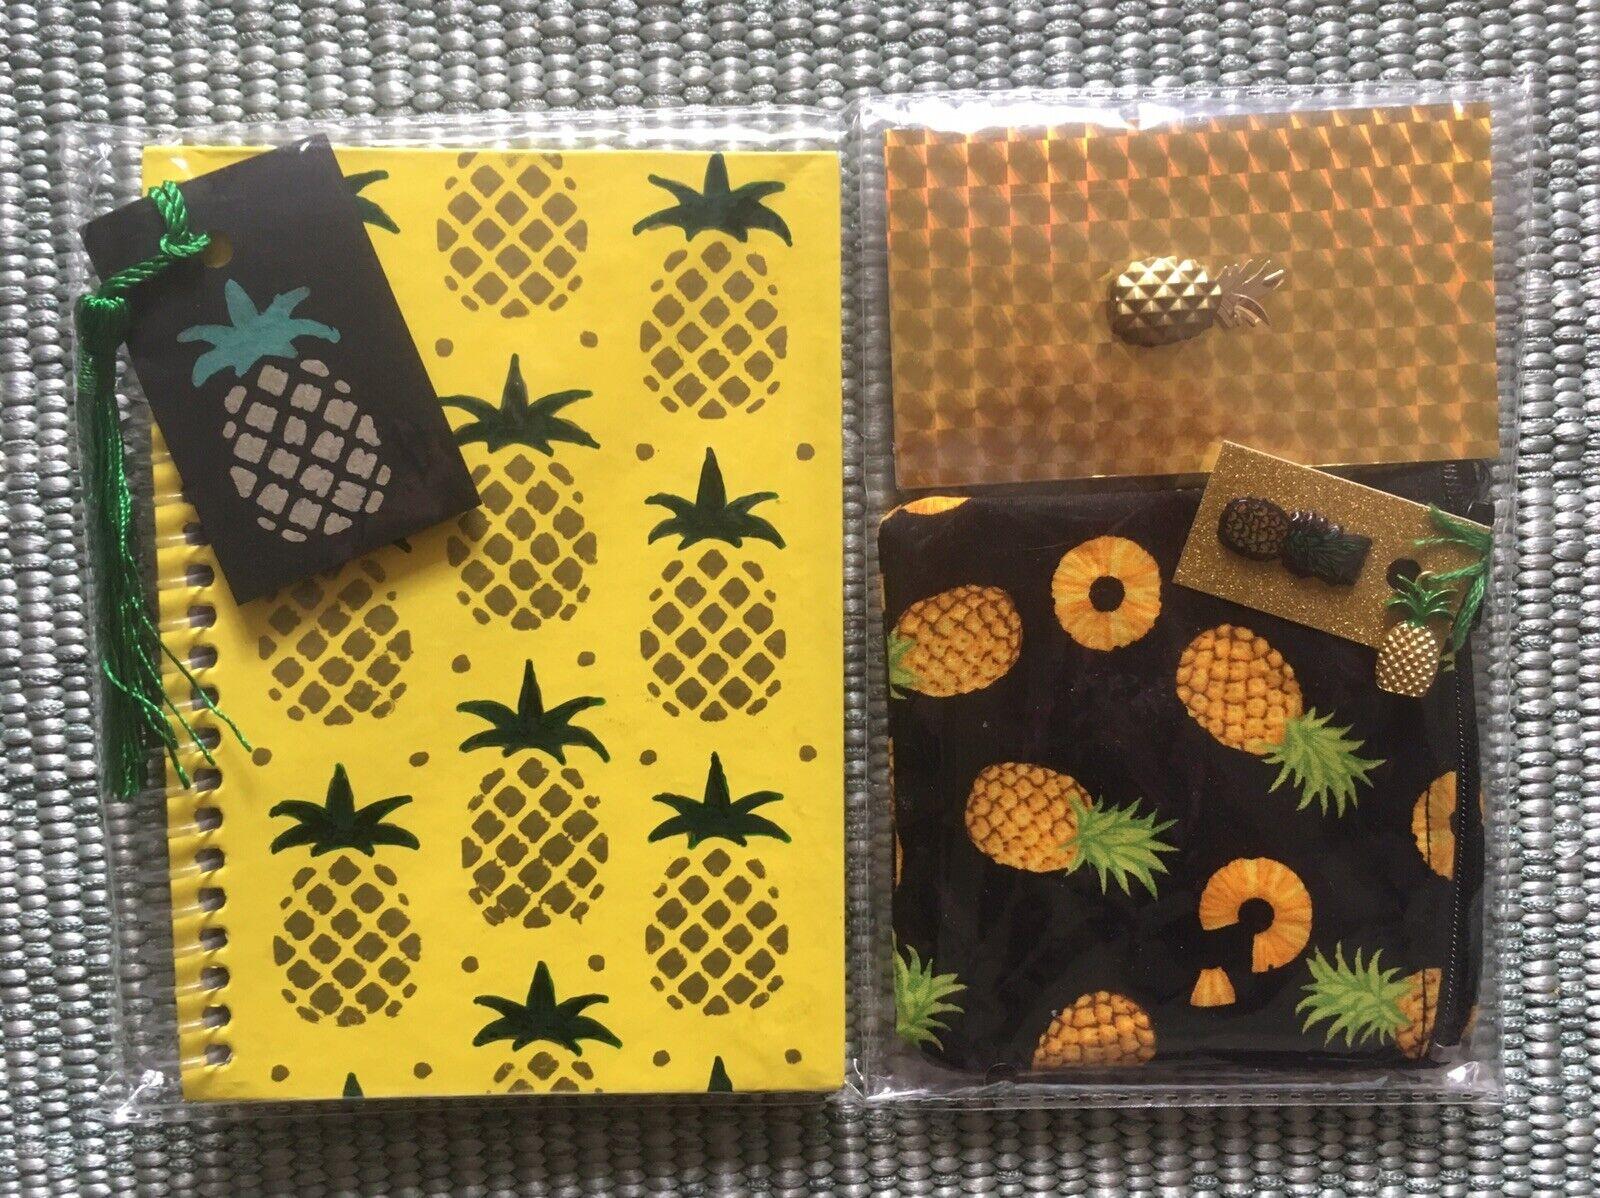 🍍Tiki A6 Pineapple Wiro Notebook +Mini Gold Jotter +Purse Tropical 3pc Gift Set